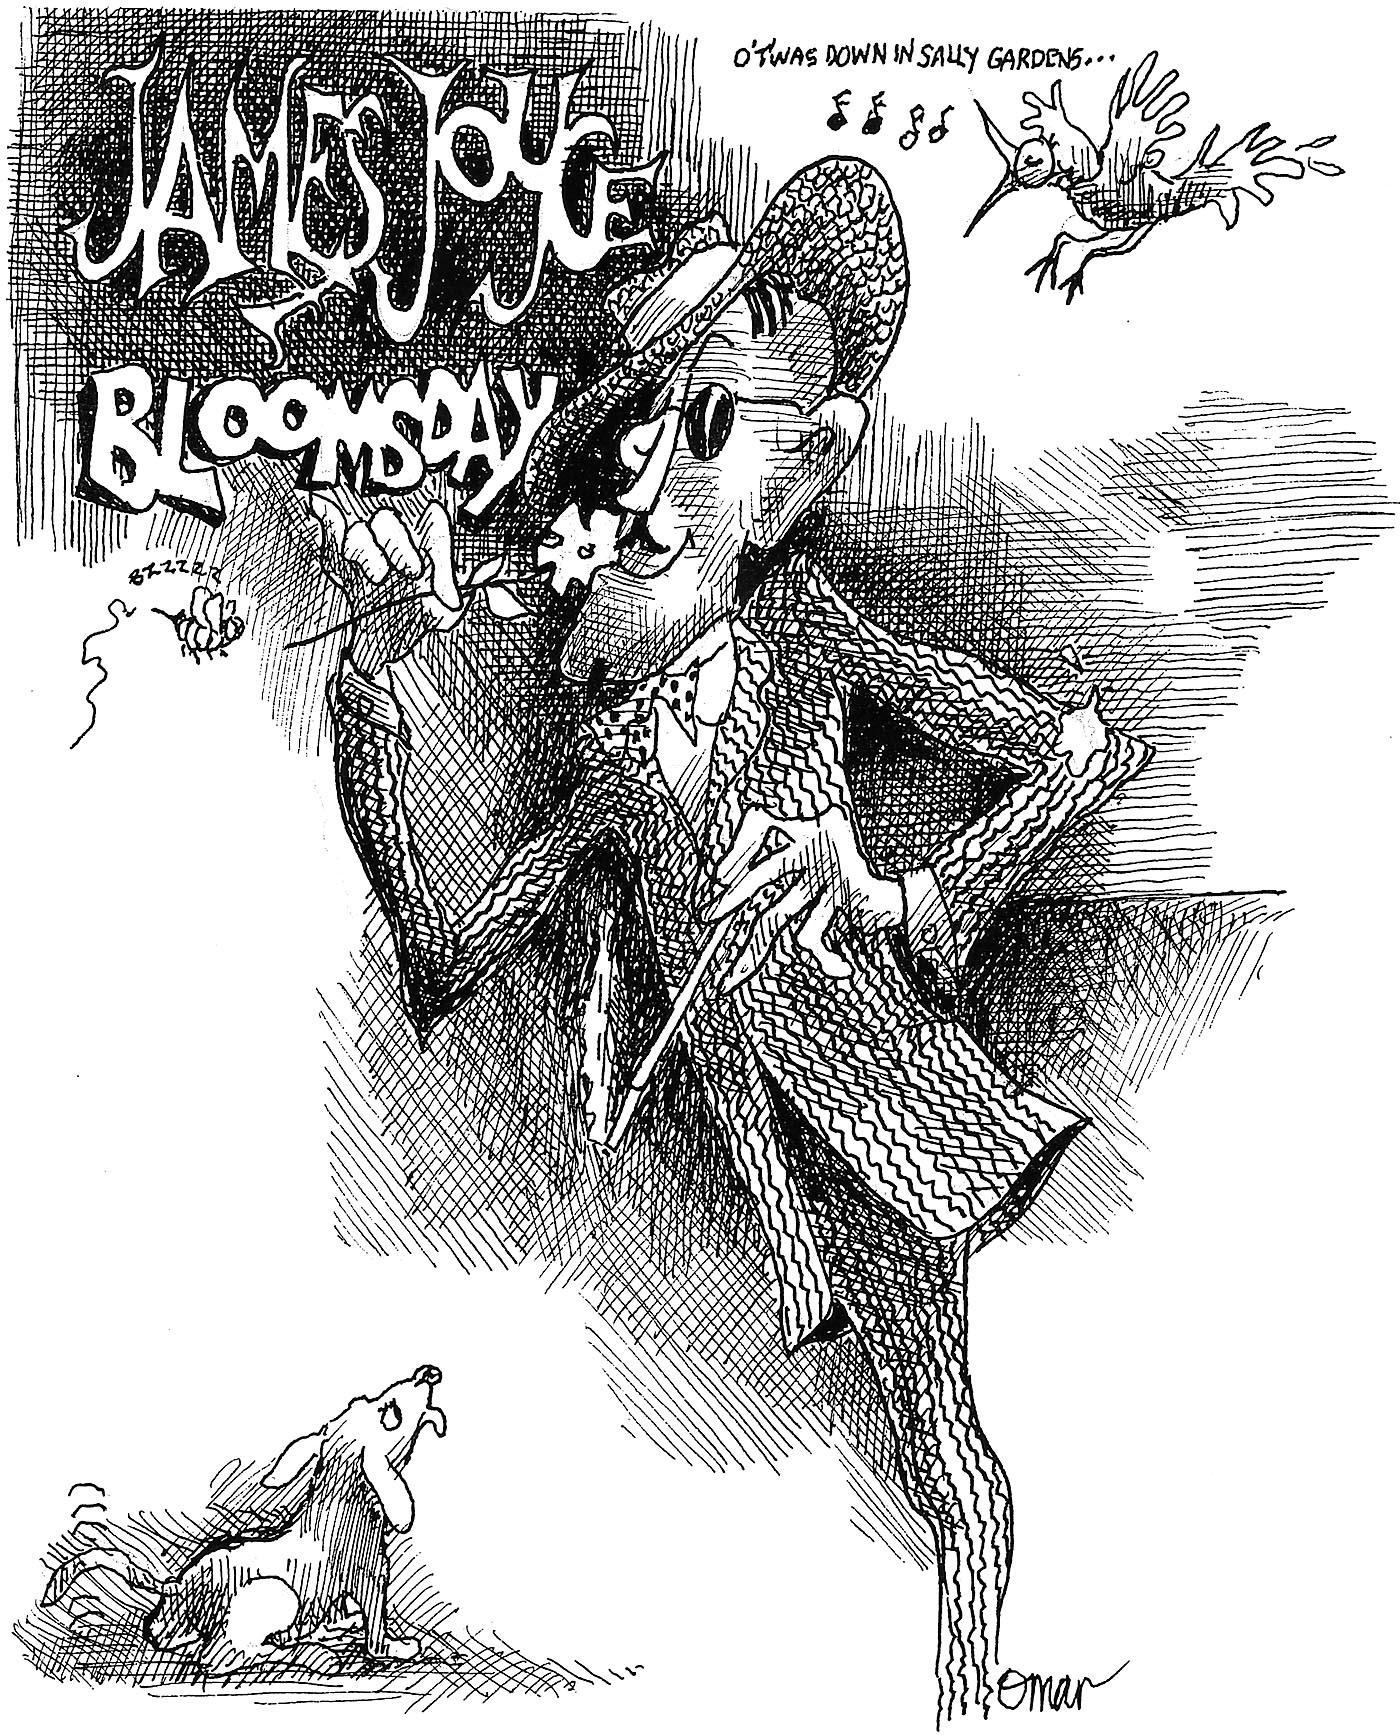 Bloomsday participants